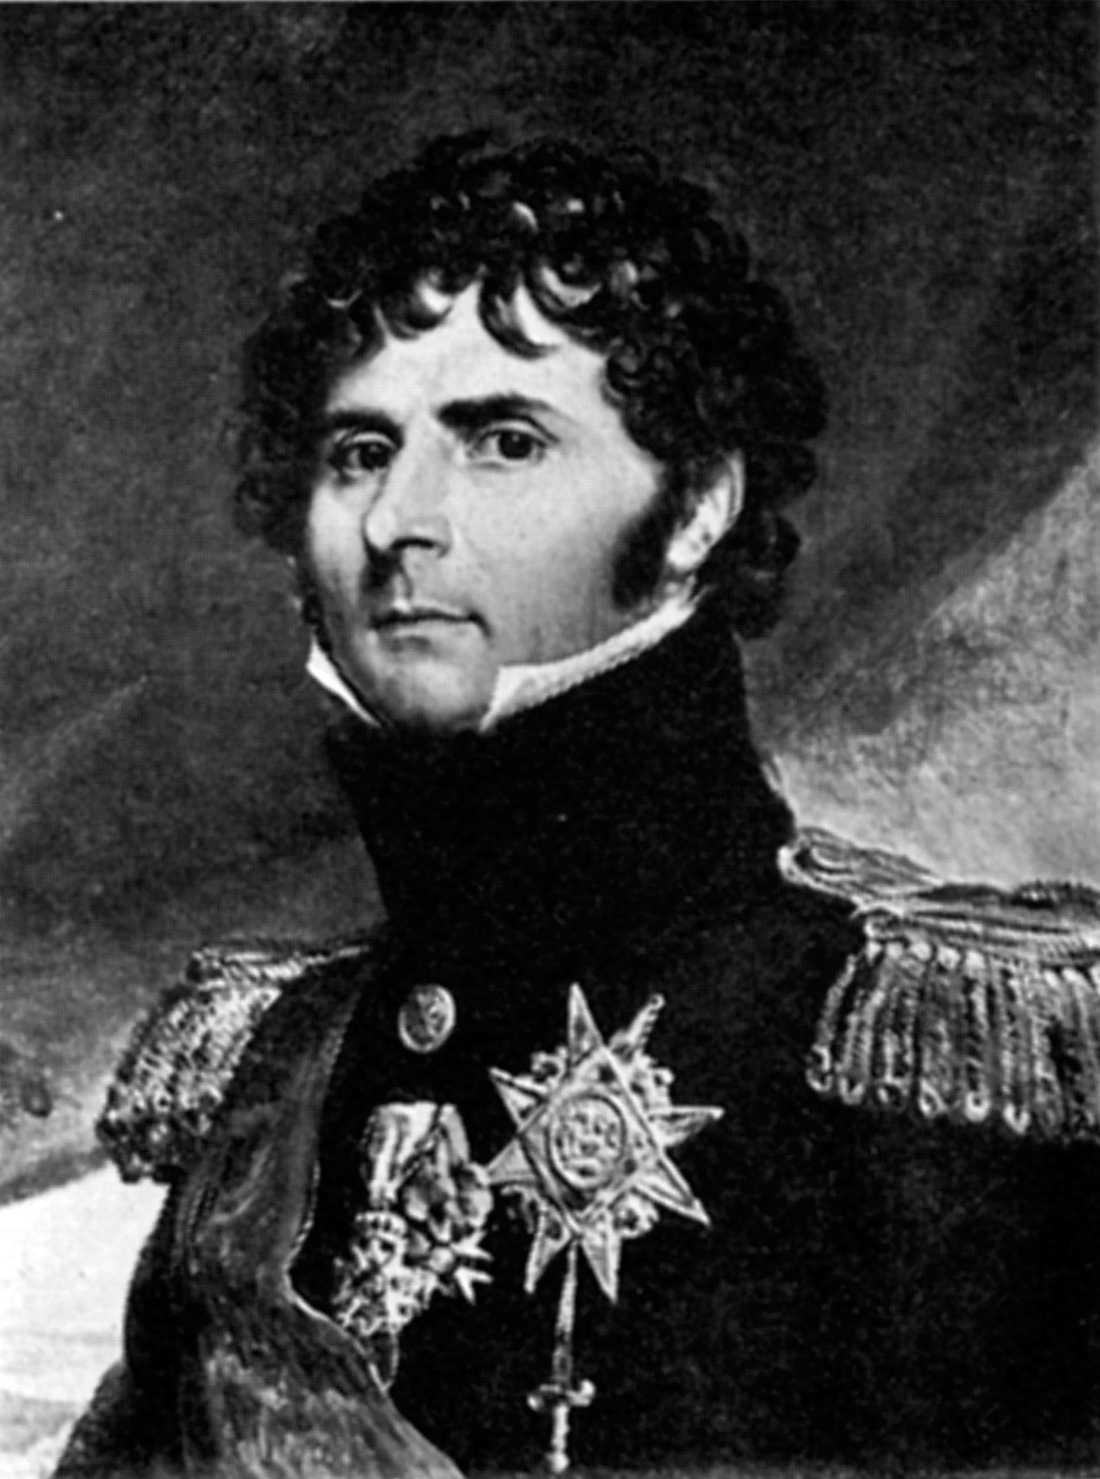 Karl XIV Johan (1763-1844).